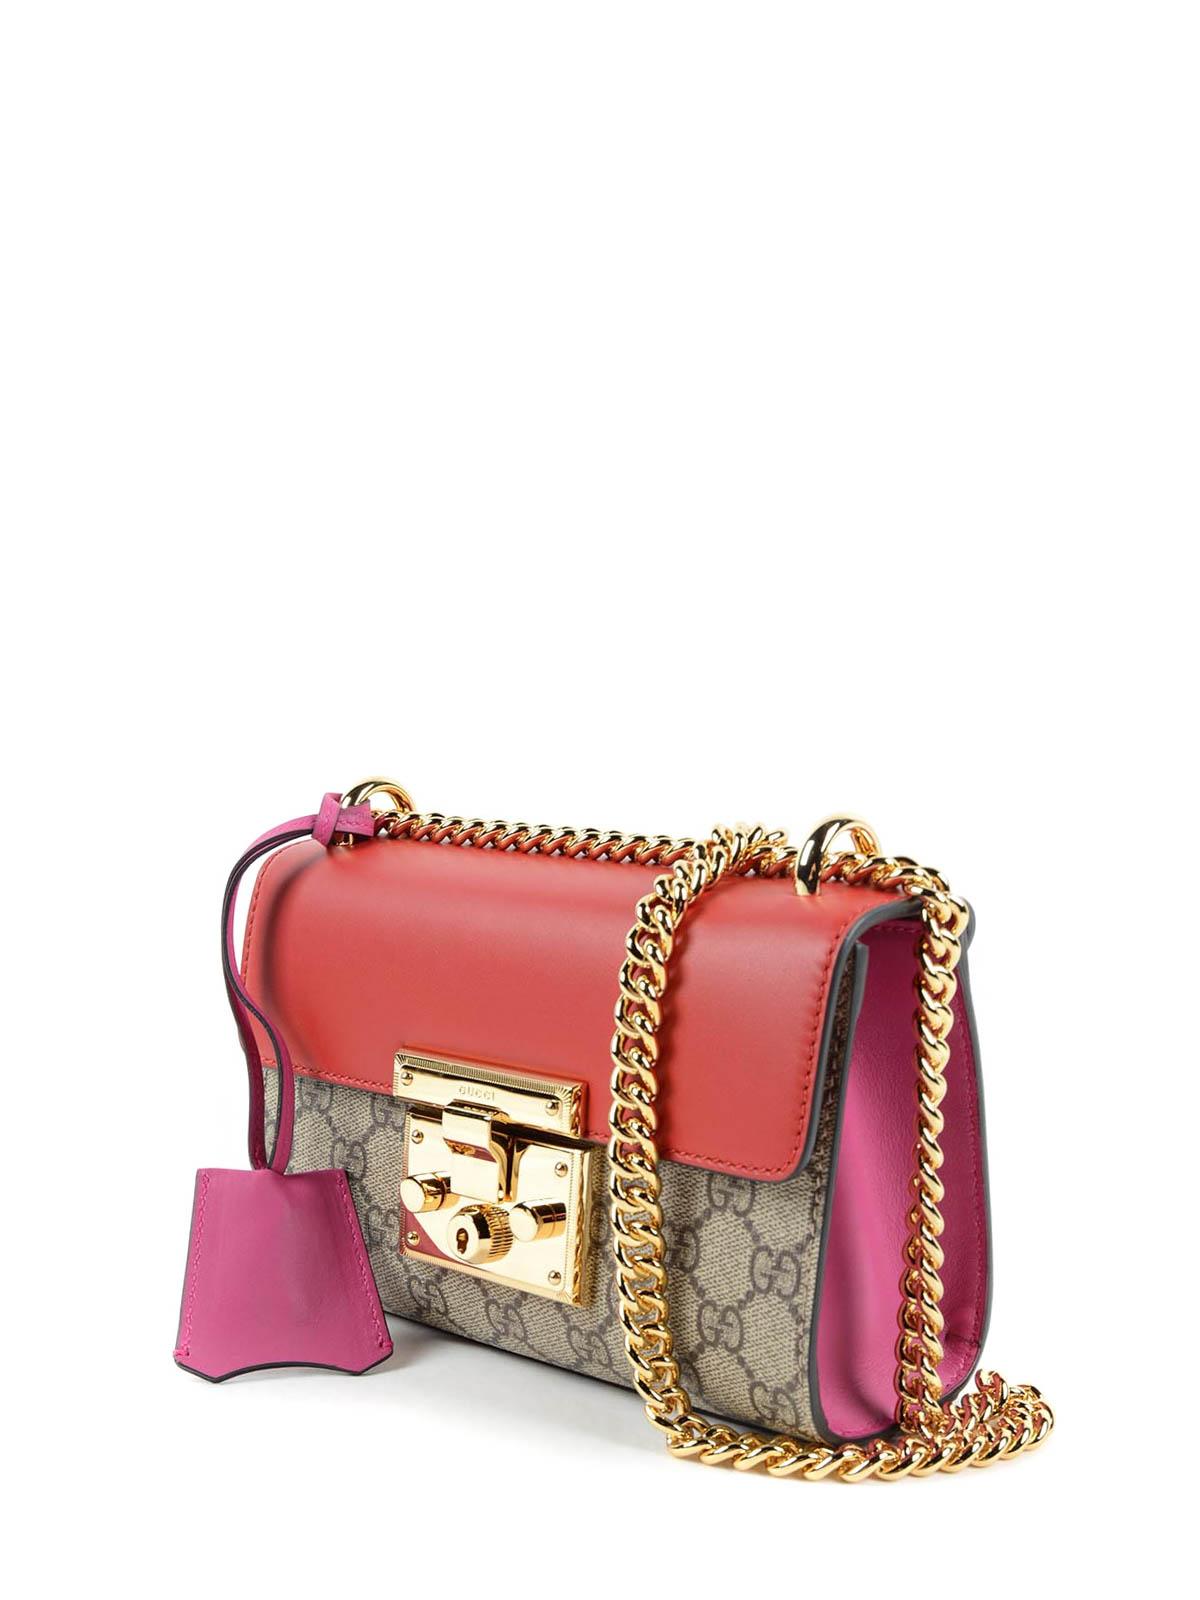 bd0ea09e Gucci - Padlock GG Supreme shoulder bag - shoulder bags - 409487 ...